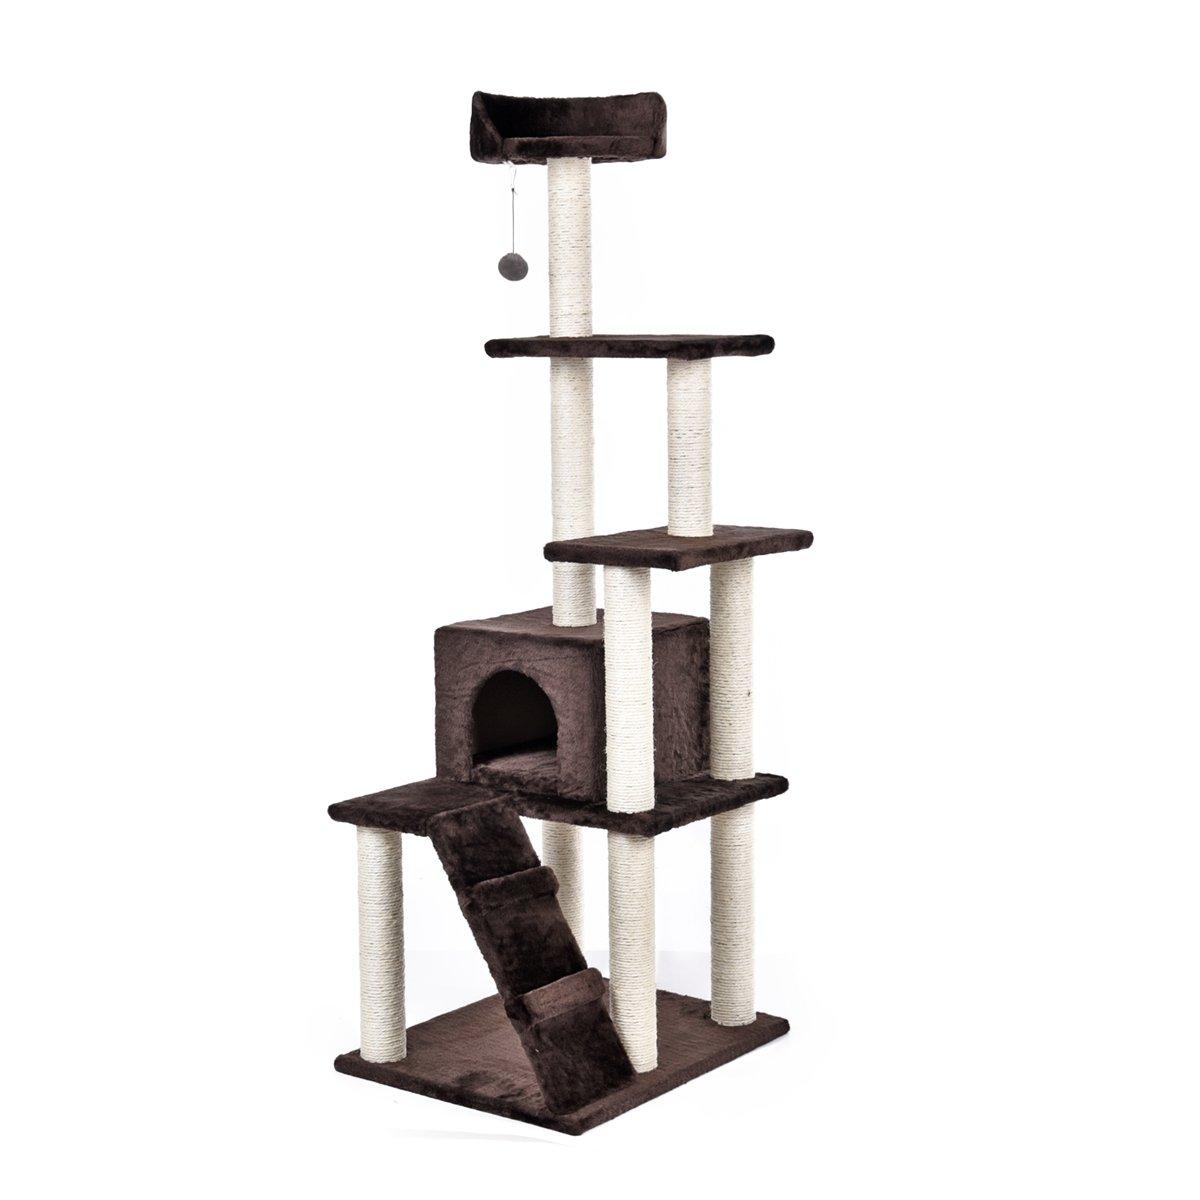 hot sale GR Cat Tree Toys Pets Apartment Furniture Scratch Activity Center Activity Tree